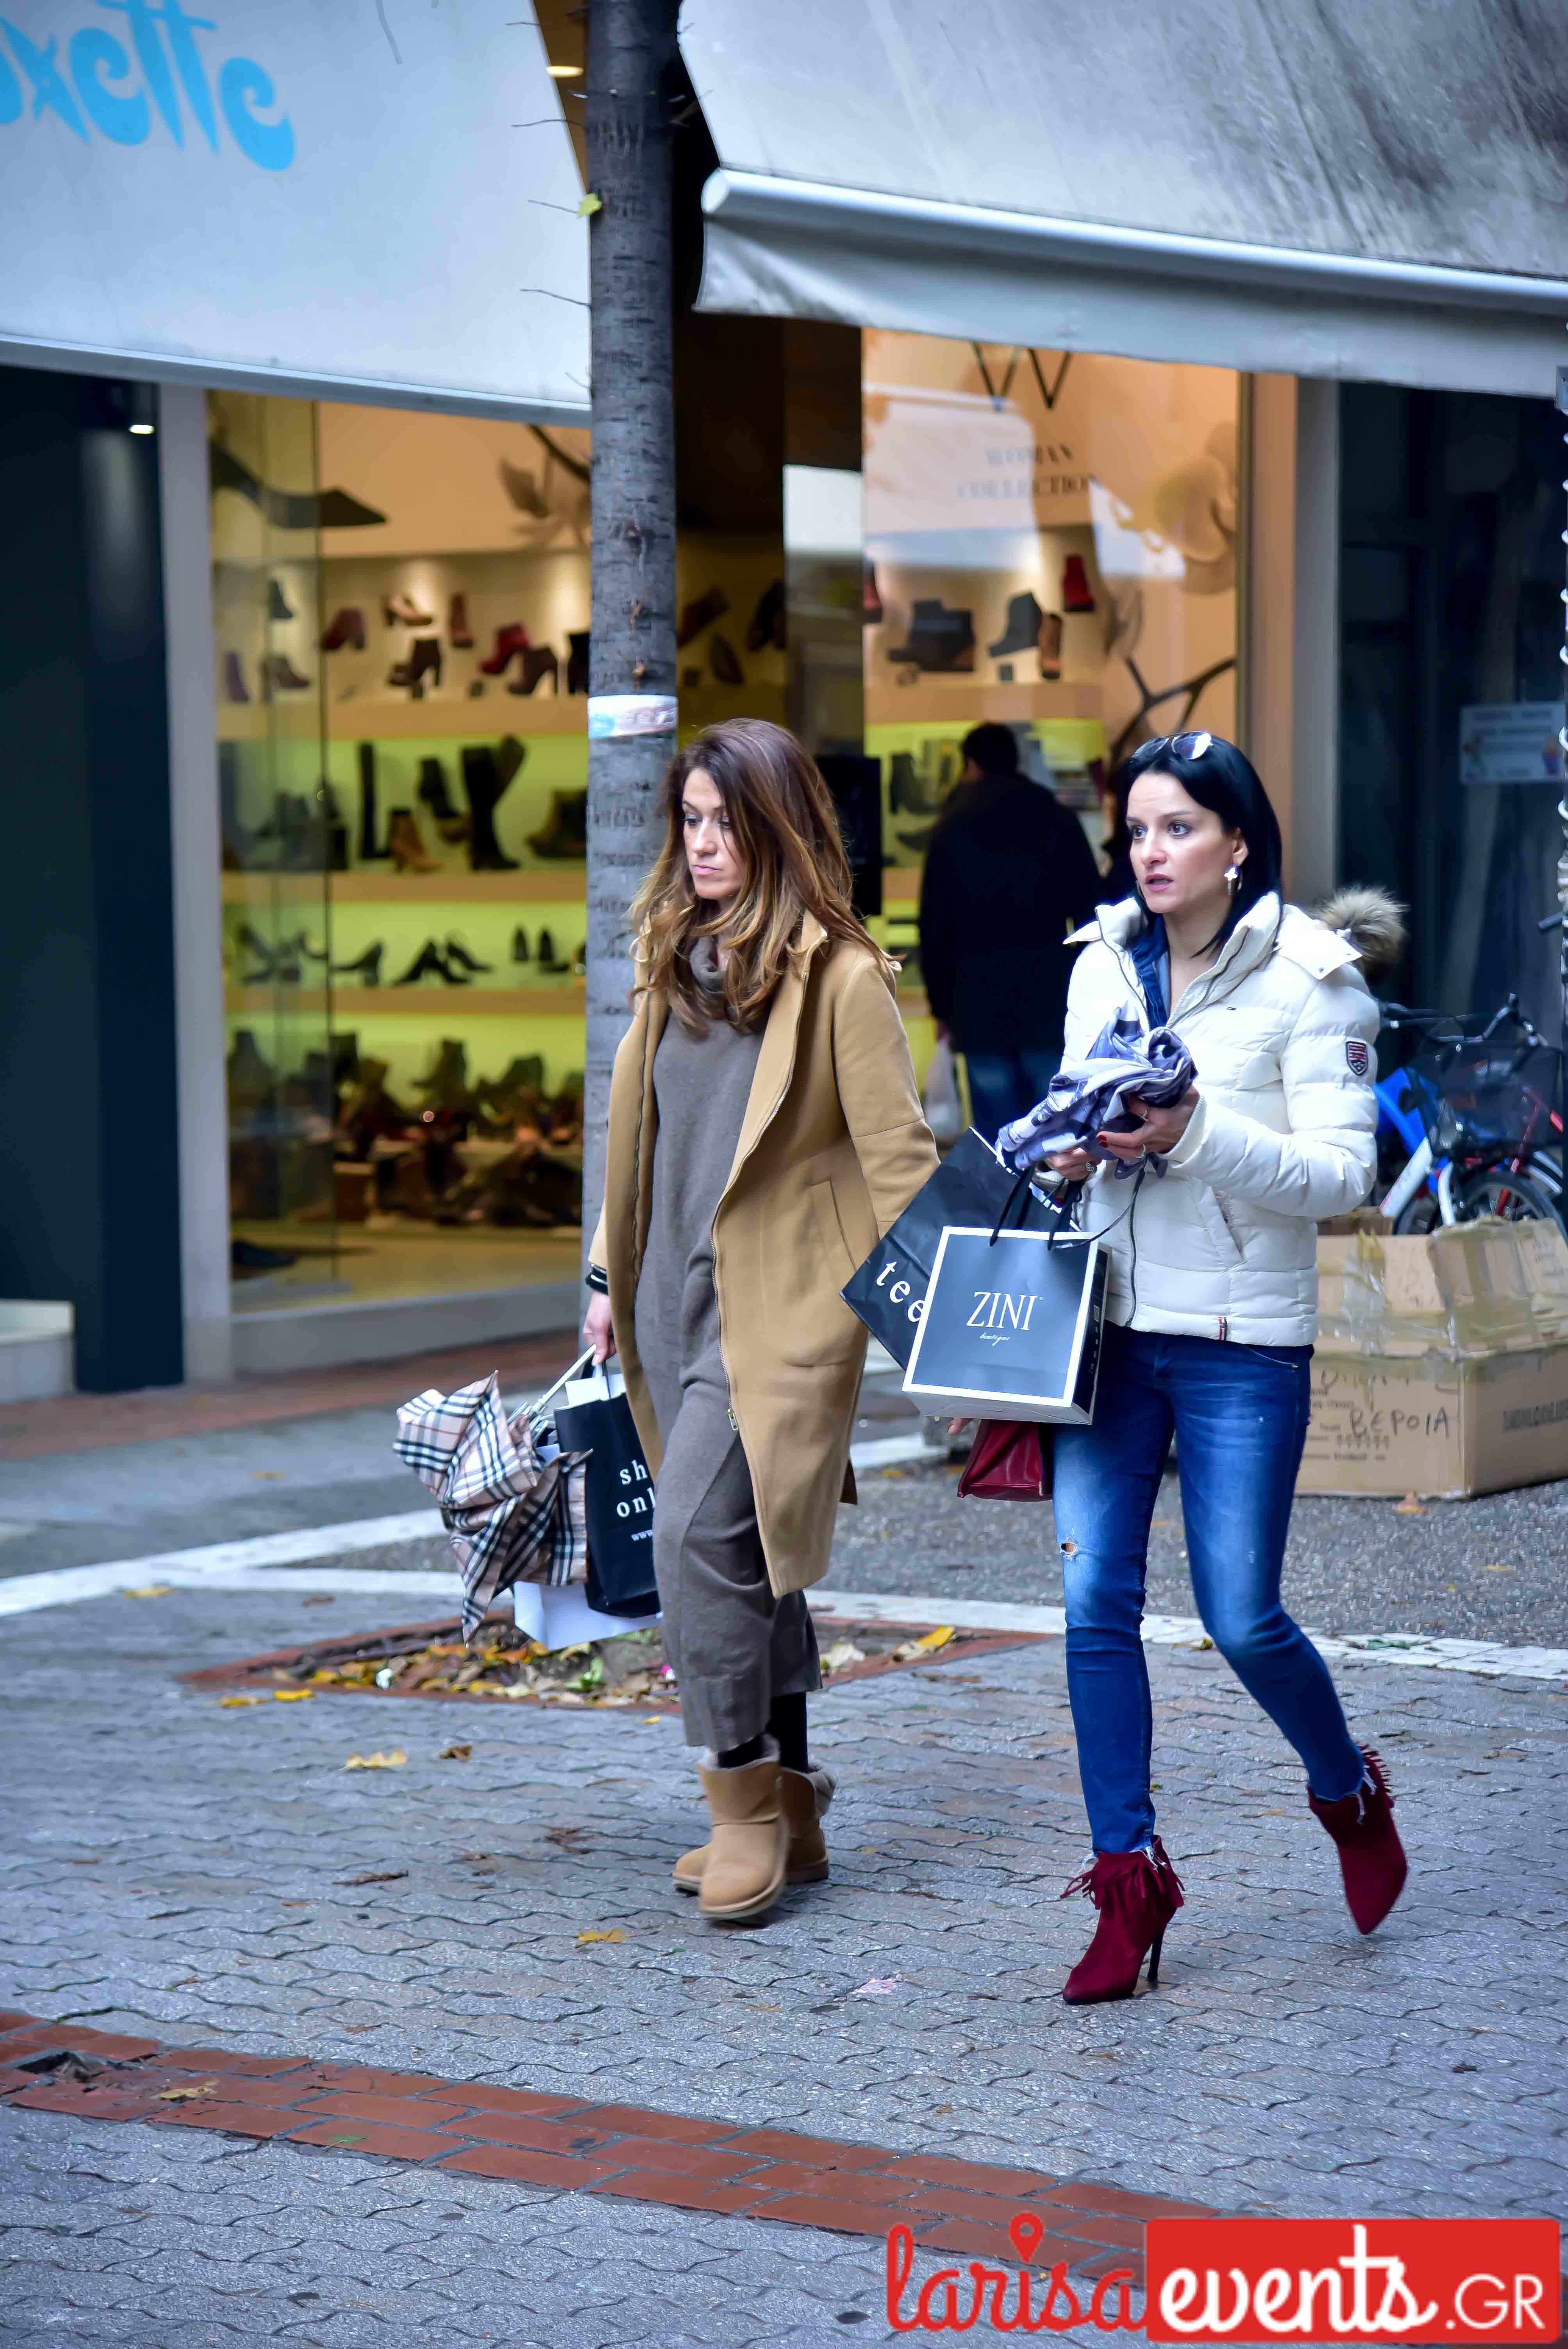 LAZ 6791 - Λάρισα's Street Style | Οι Λαρισαίοι σε street style clicks!